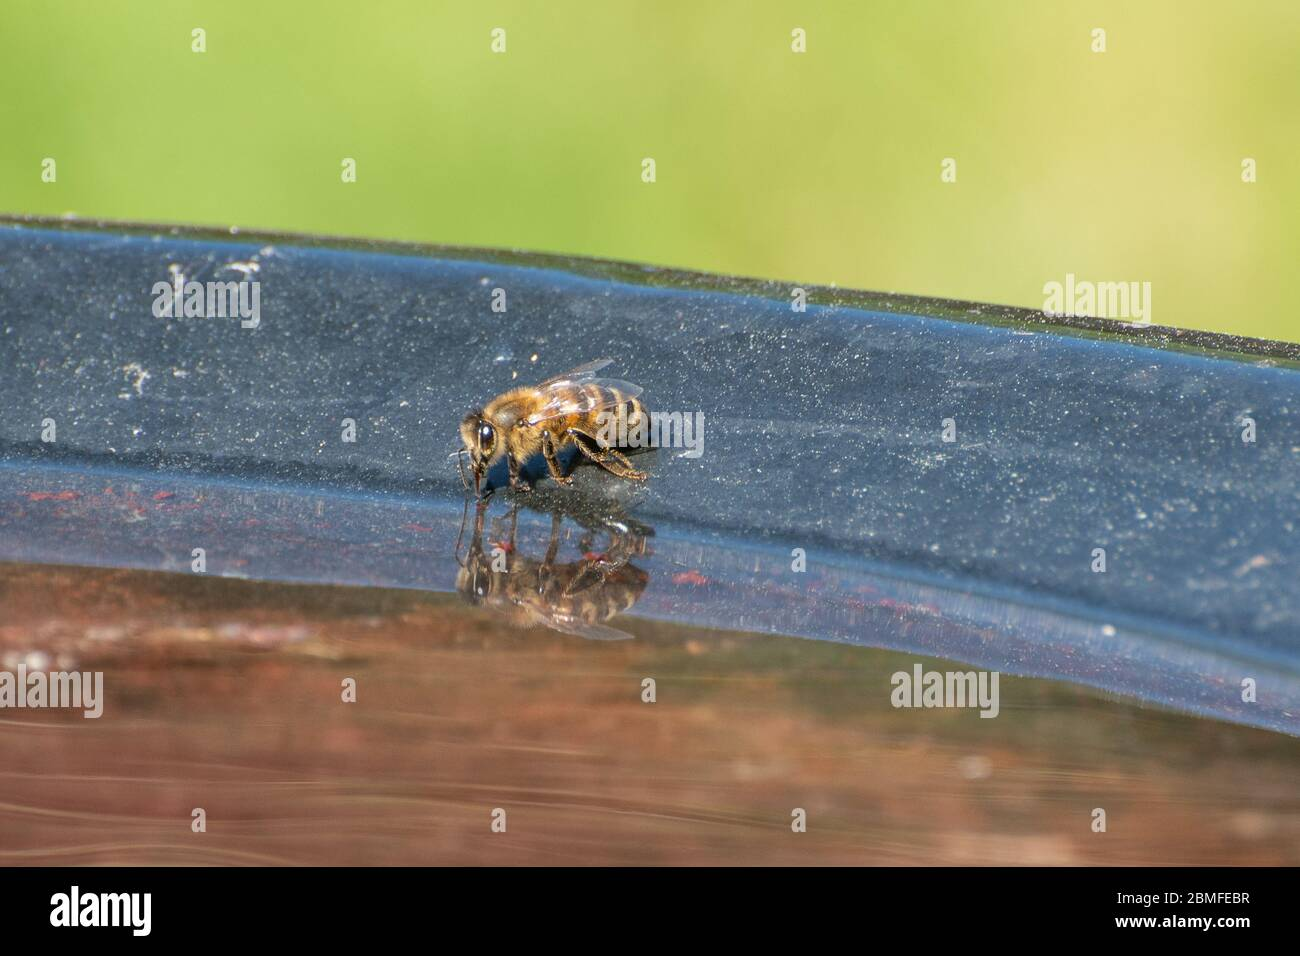 honey-bee-apis-mellifera-drinking-water-from-a-bird-bath-in-a-garden-garden-wildlife-uk-2BMFEBR.jpg